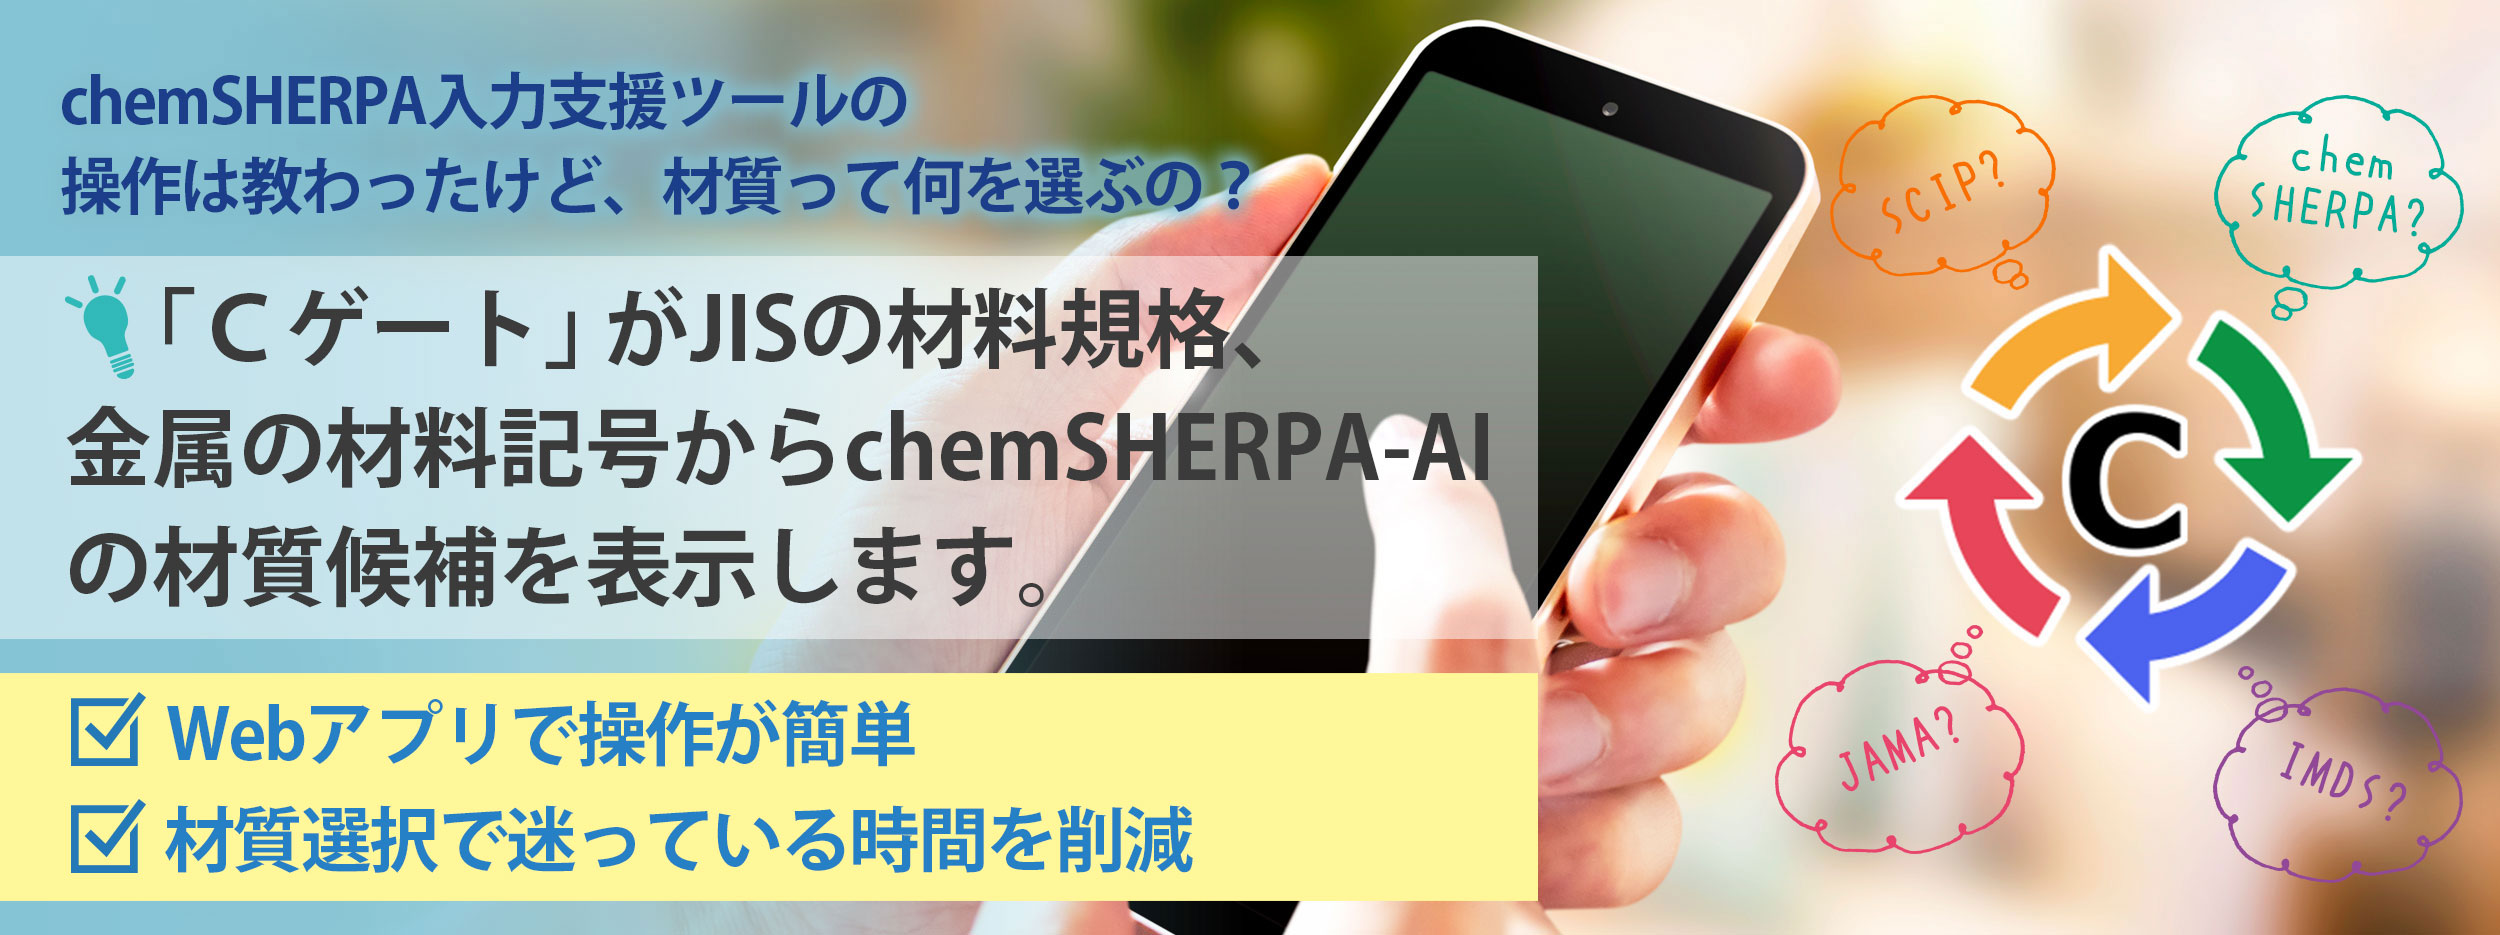 「Cゲート」製品含有化学物質管理報告書ツール(Webアプリ)のご案内